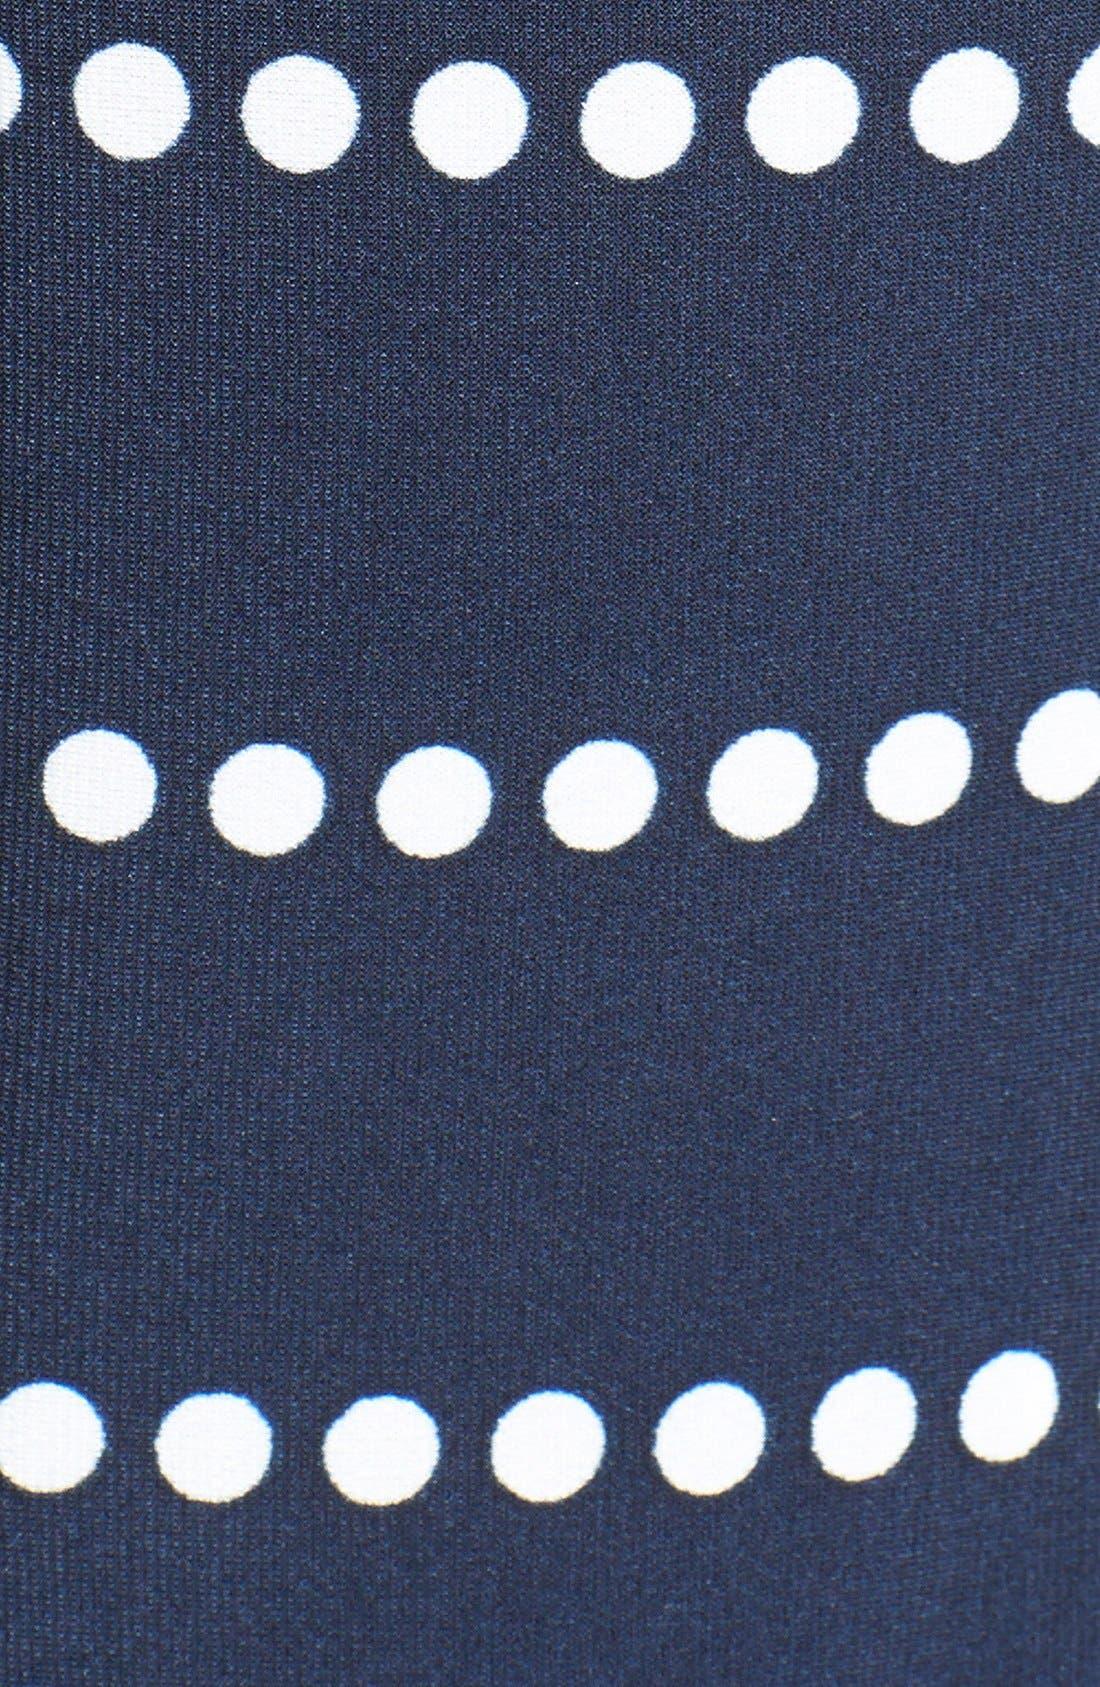 Alternate Image 3  - Taylor Dresses Side Tie Print Jersey Sheath Dress (Petite)